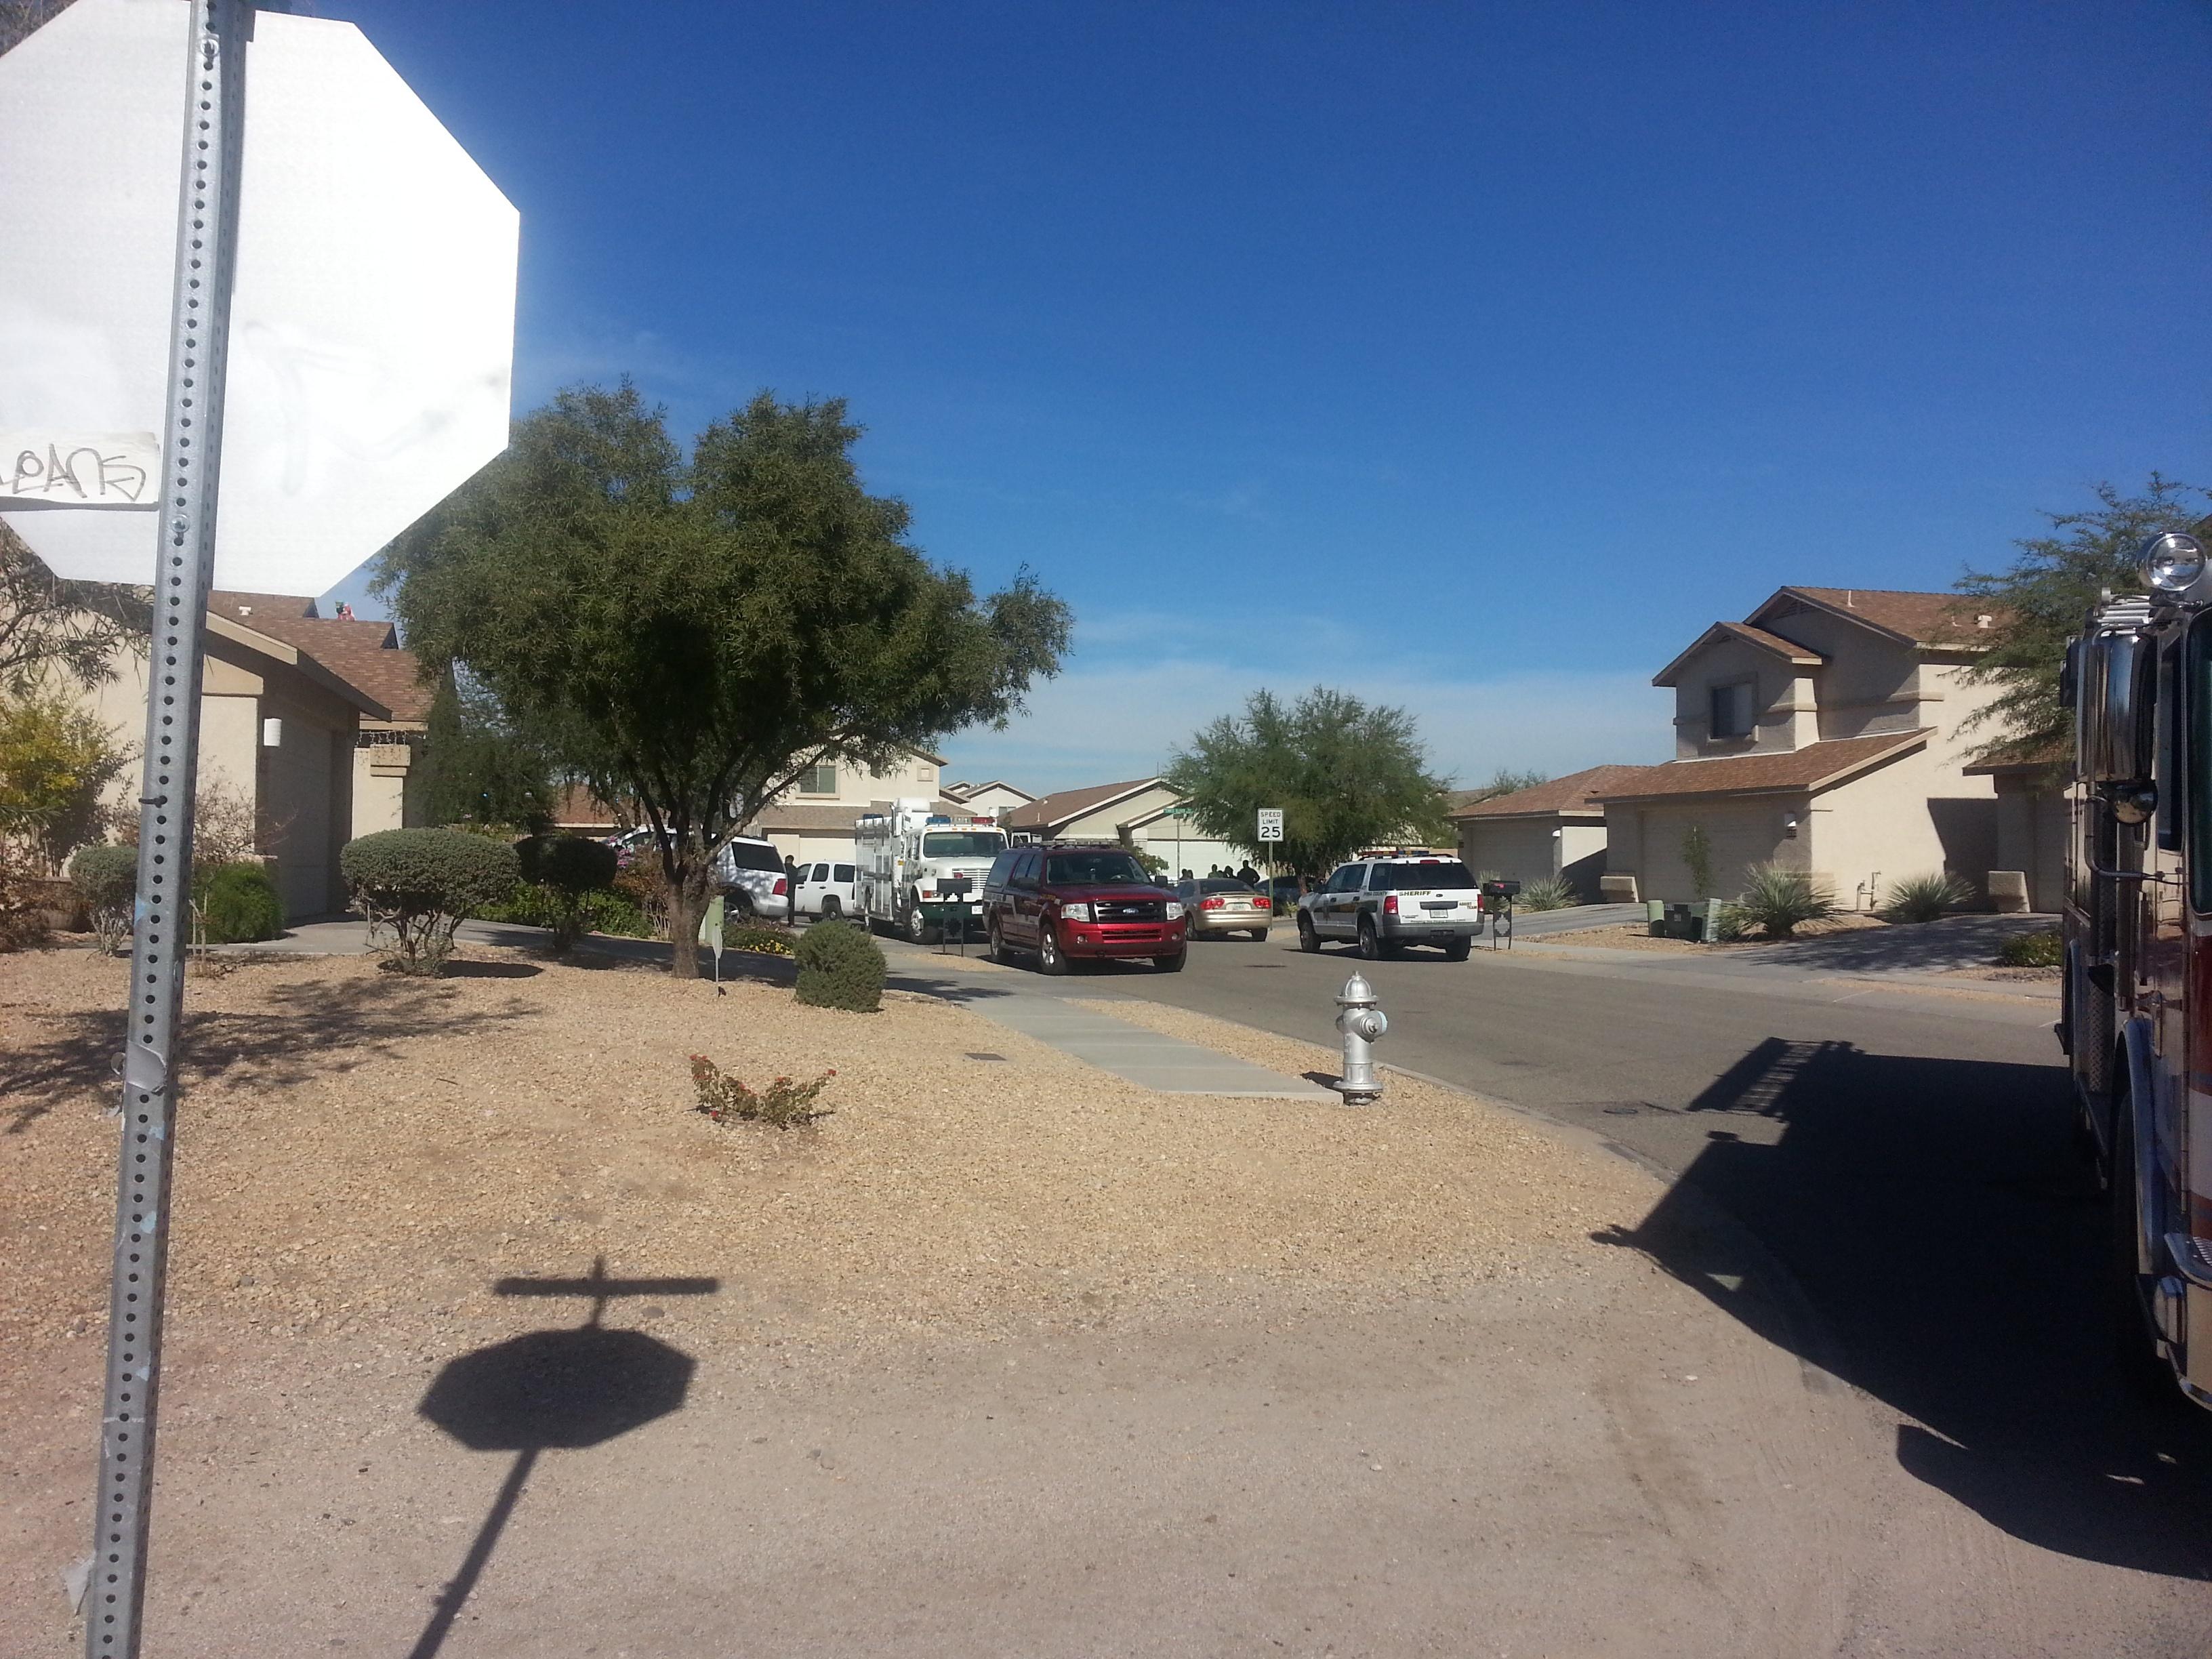 Standoff situation in Northwest Tucson, Arizona